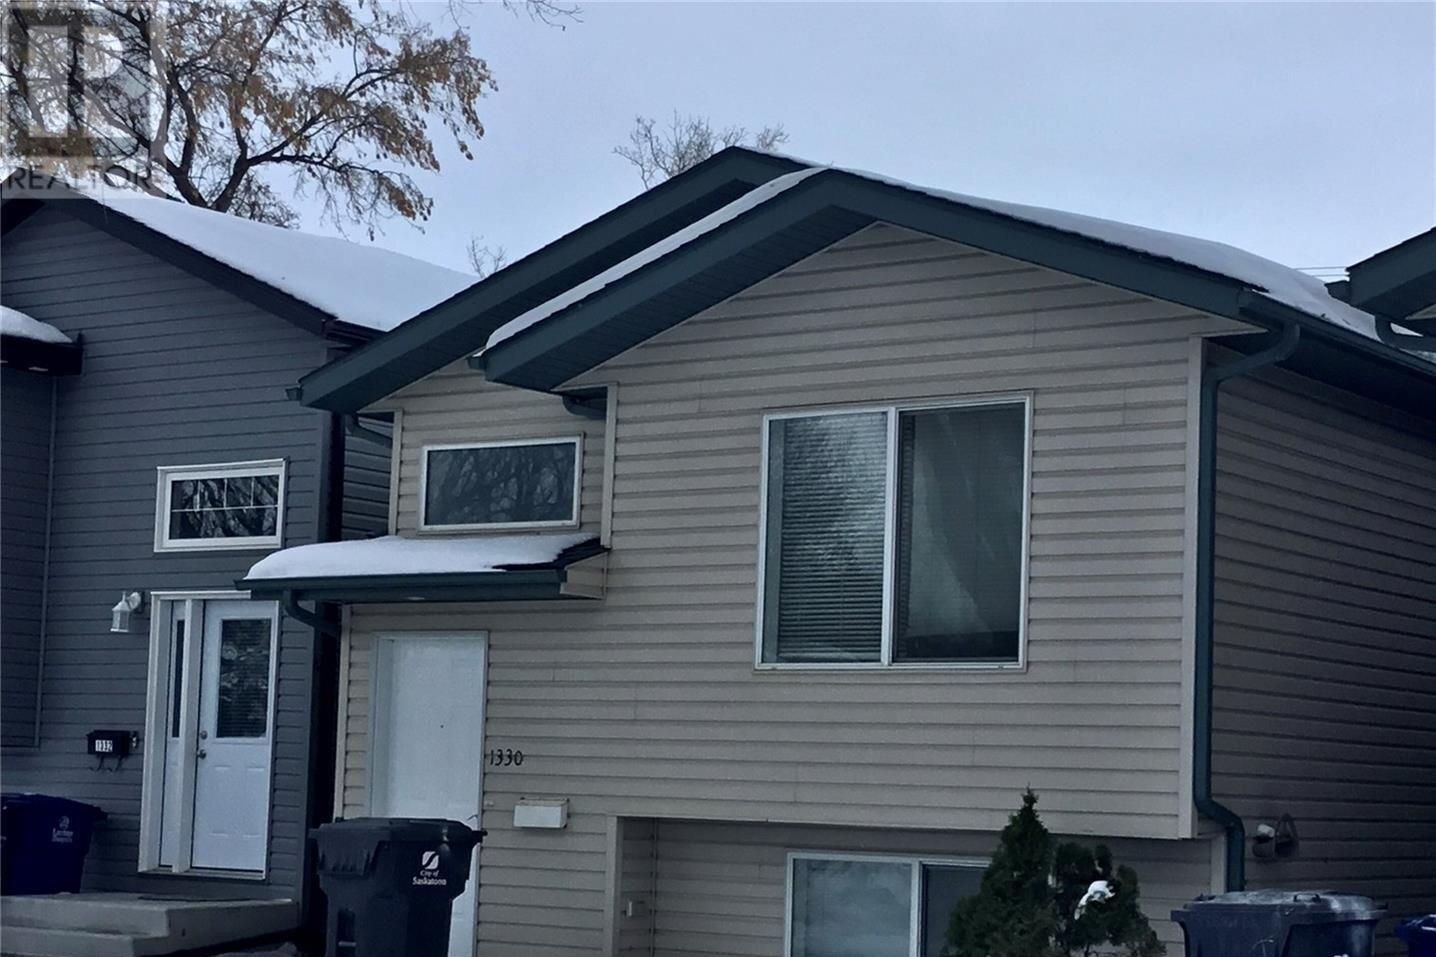 House for sale at 1330 I Ave N Saskatoon Saskatchewan - MLS: SK823487